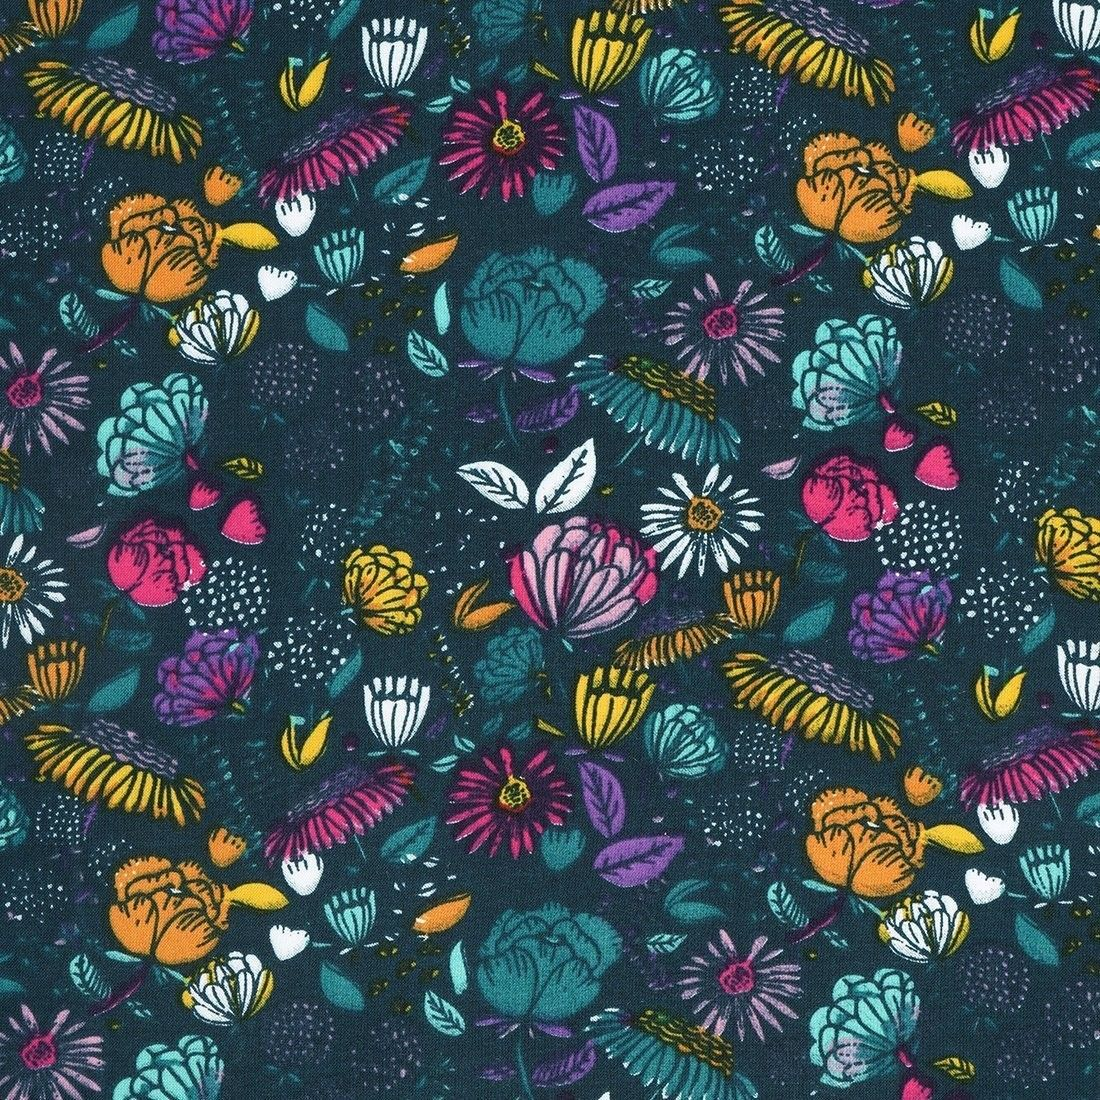 Tissu Popeline De Viscose Vert A Fleurs Mondial Tissus Fleur Multicolore Fleurs Tissu